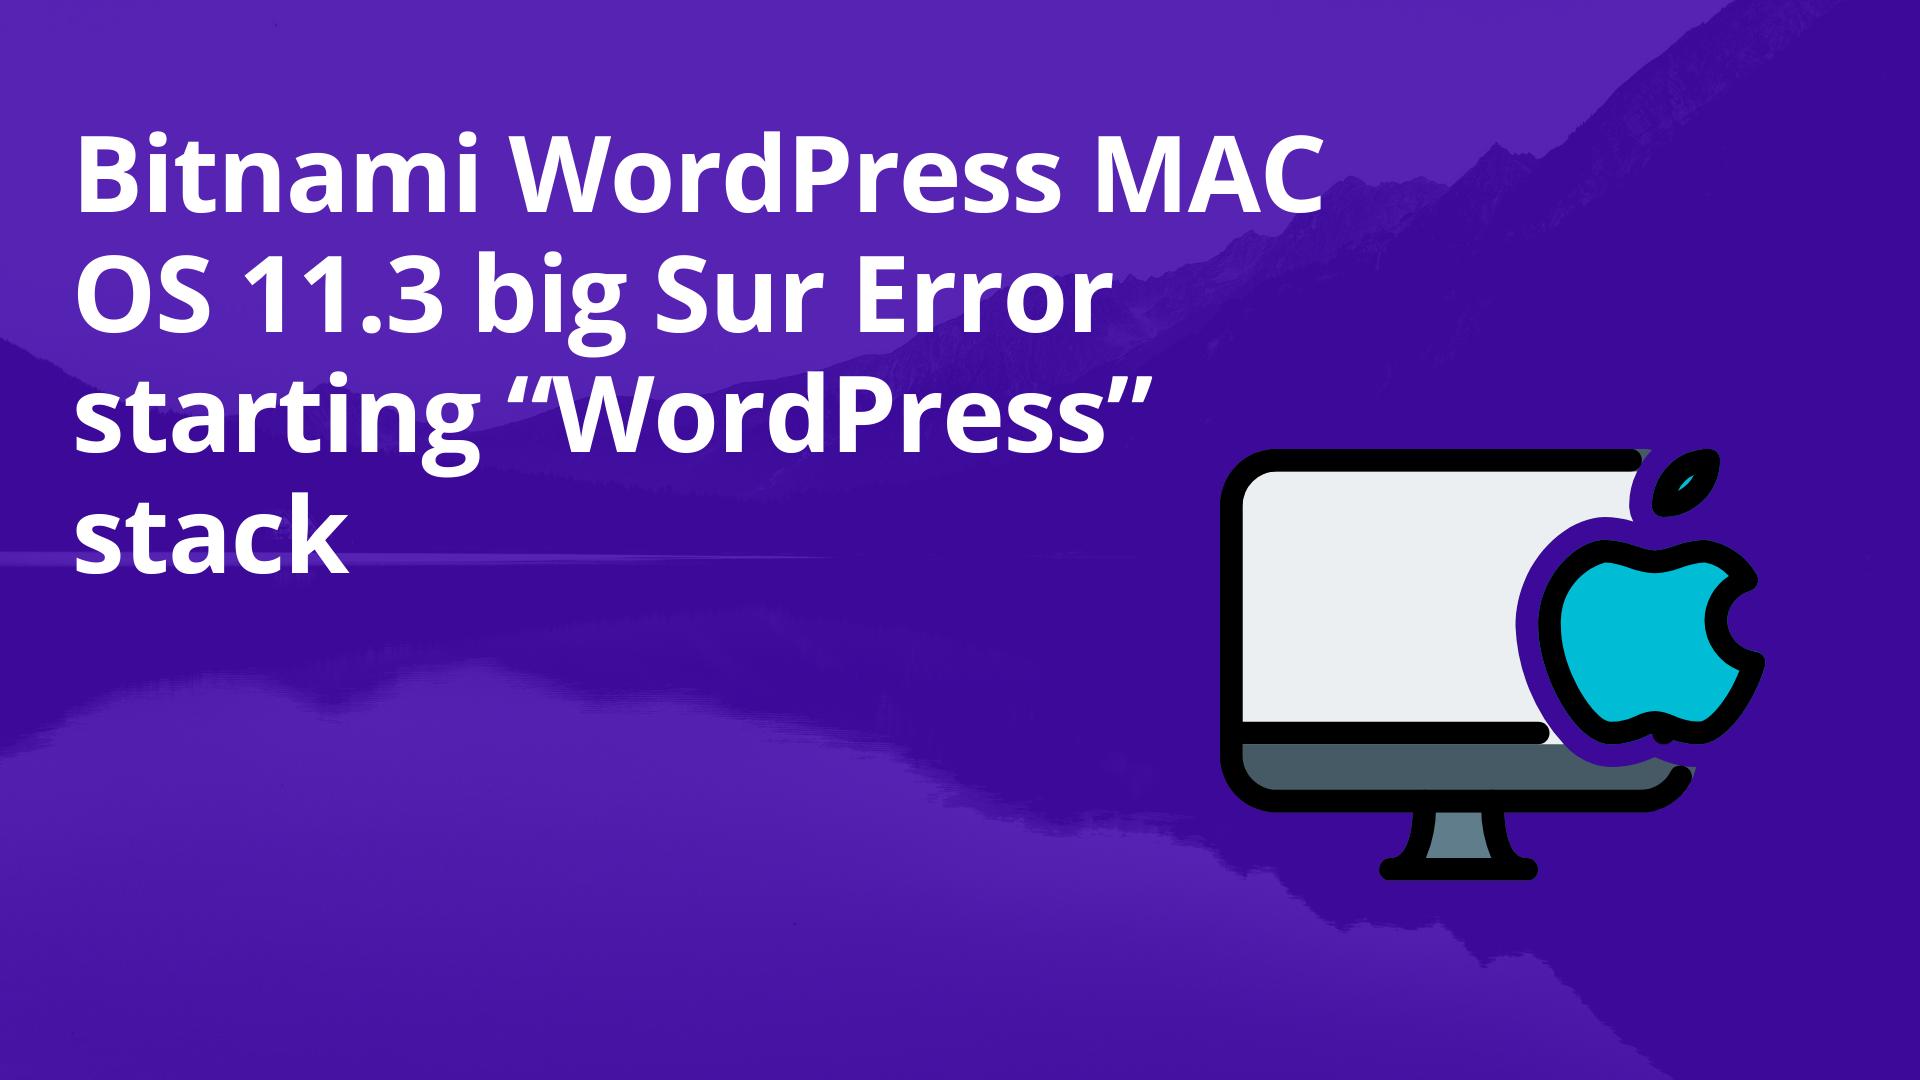 "Feature image of How to Solve the Bitnami WordPress MAC OS 11.3 big Sur Error starting ""WordPress"" stack"